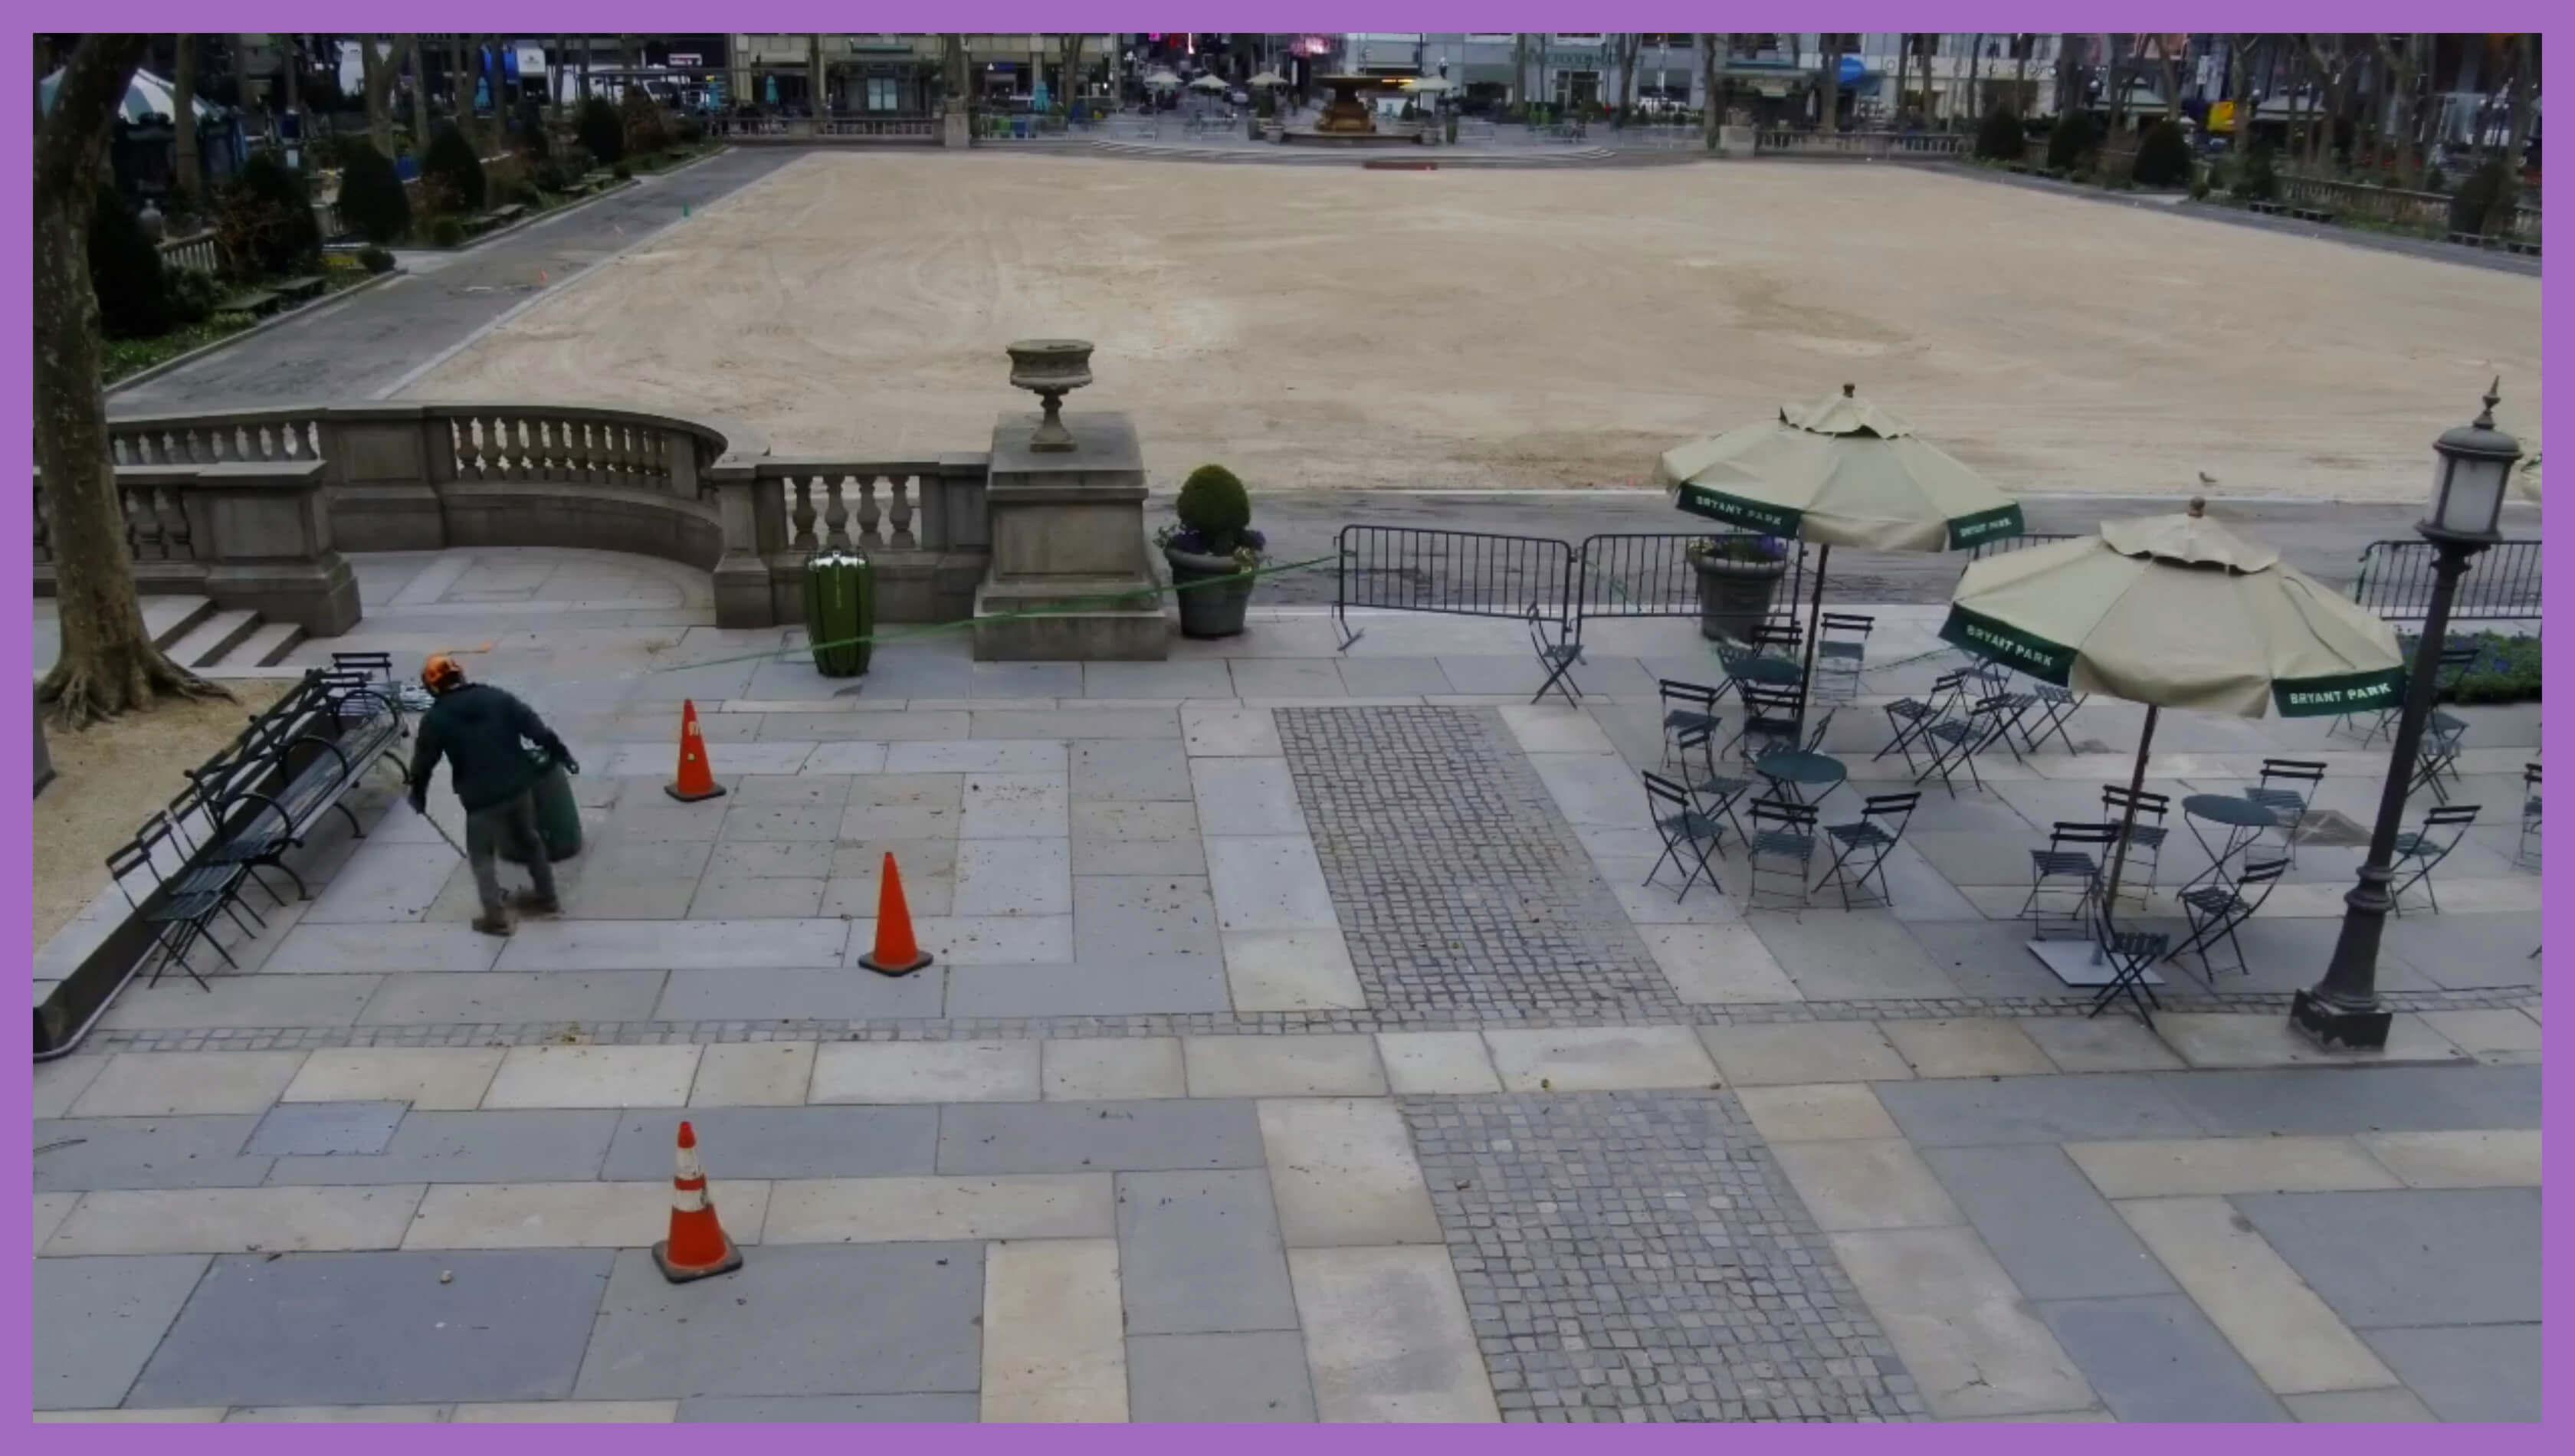 nyc_bryant_park